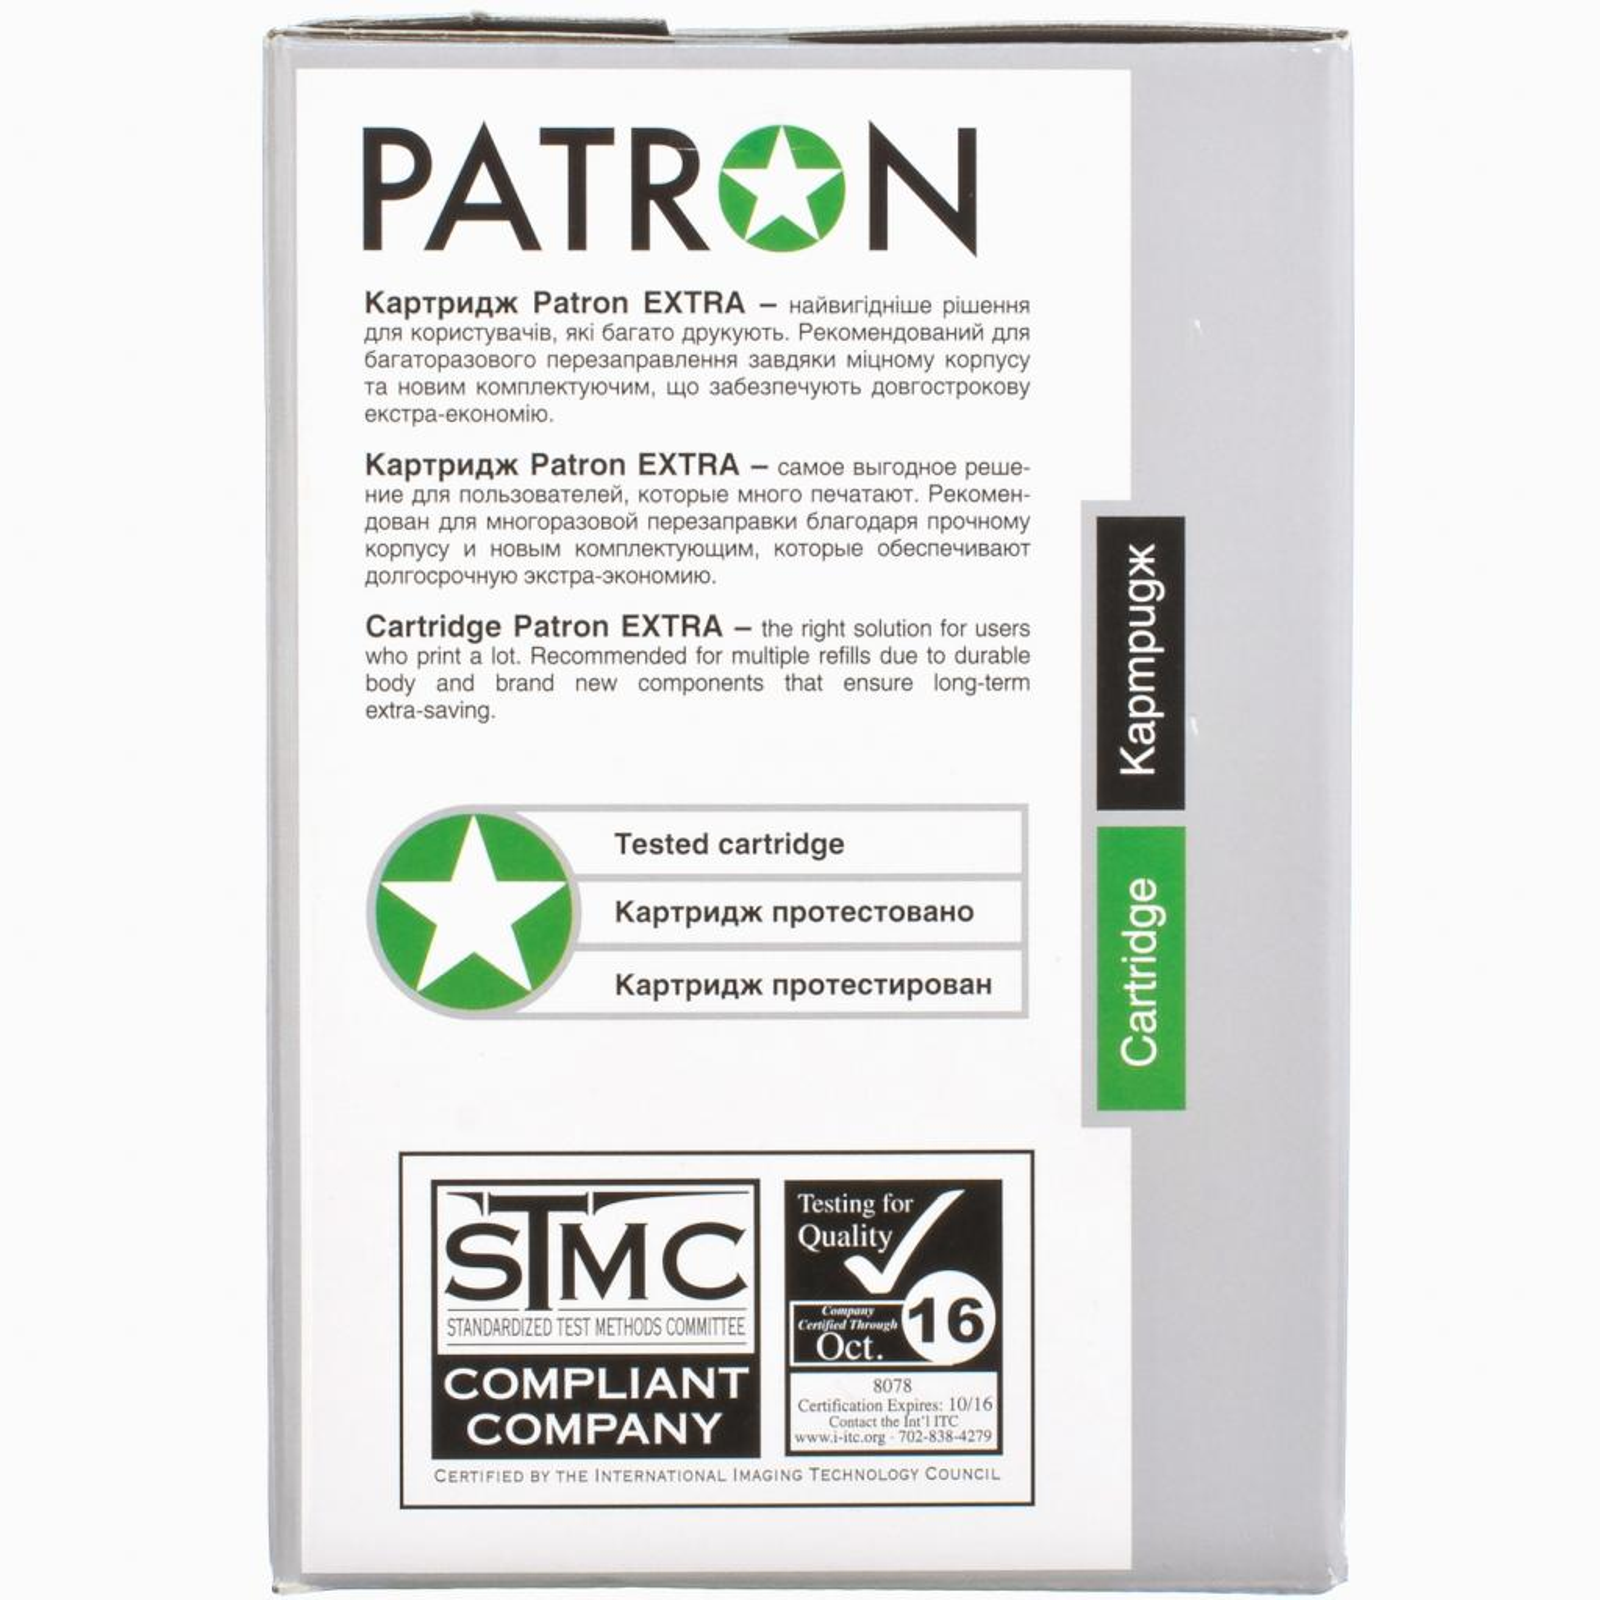 Картридж PATRON HP CLJ CP2025/ CM2320 (PN-304AKR) BLACK Extra (CT-HP-CC530A-B-PN-R) изображение 6